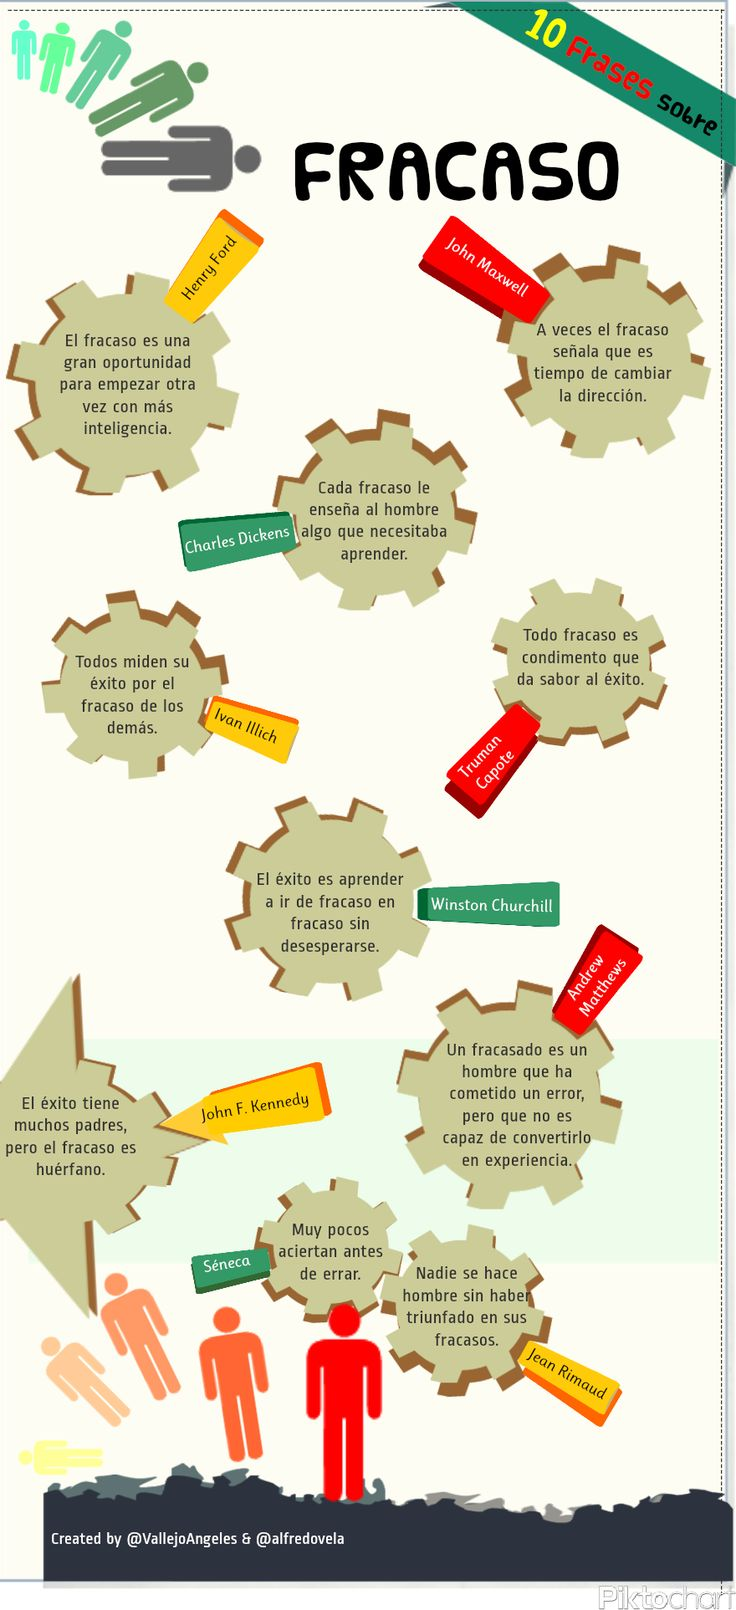 10 frases célebres sobre el fracaso #infografia